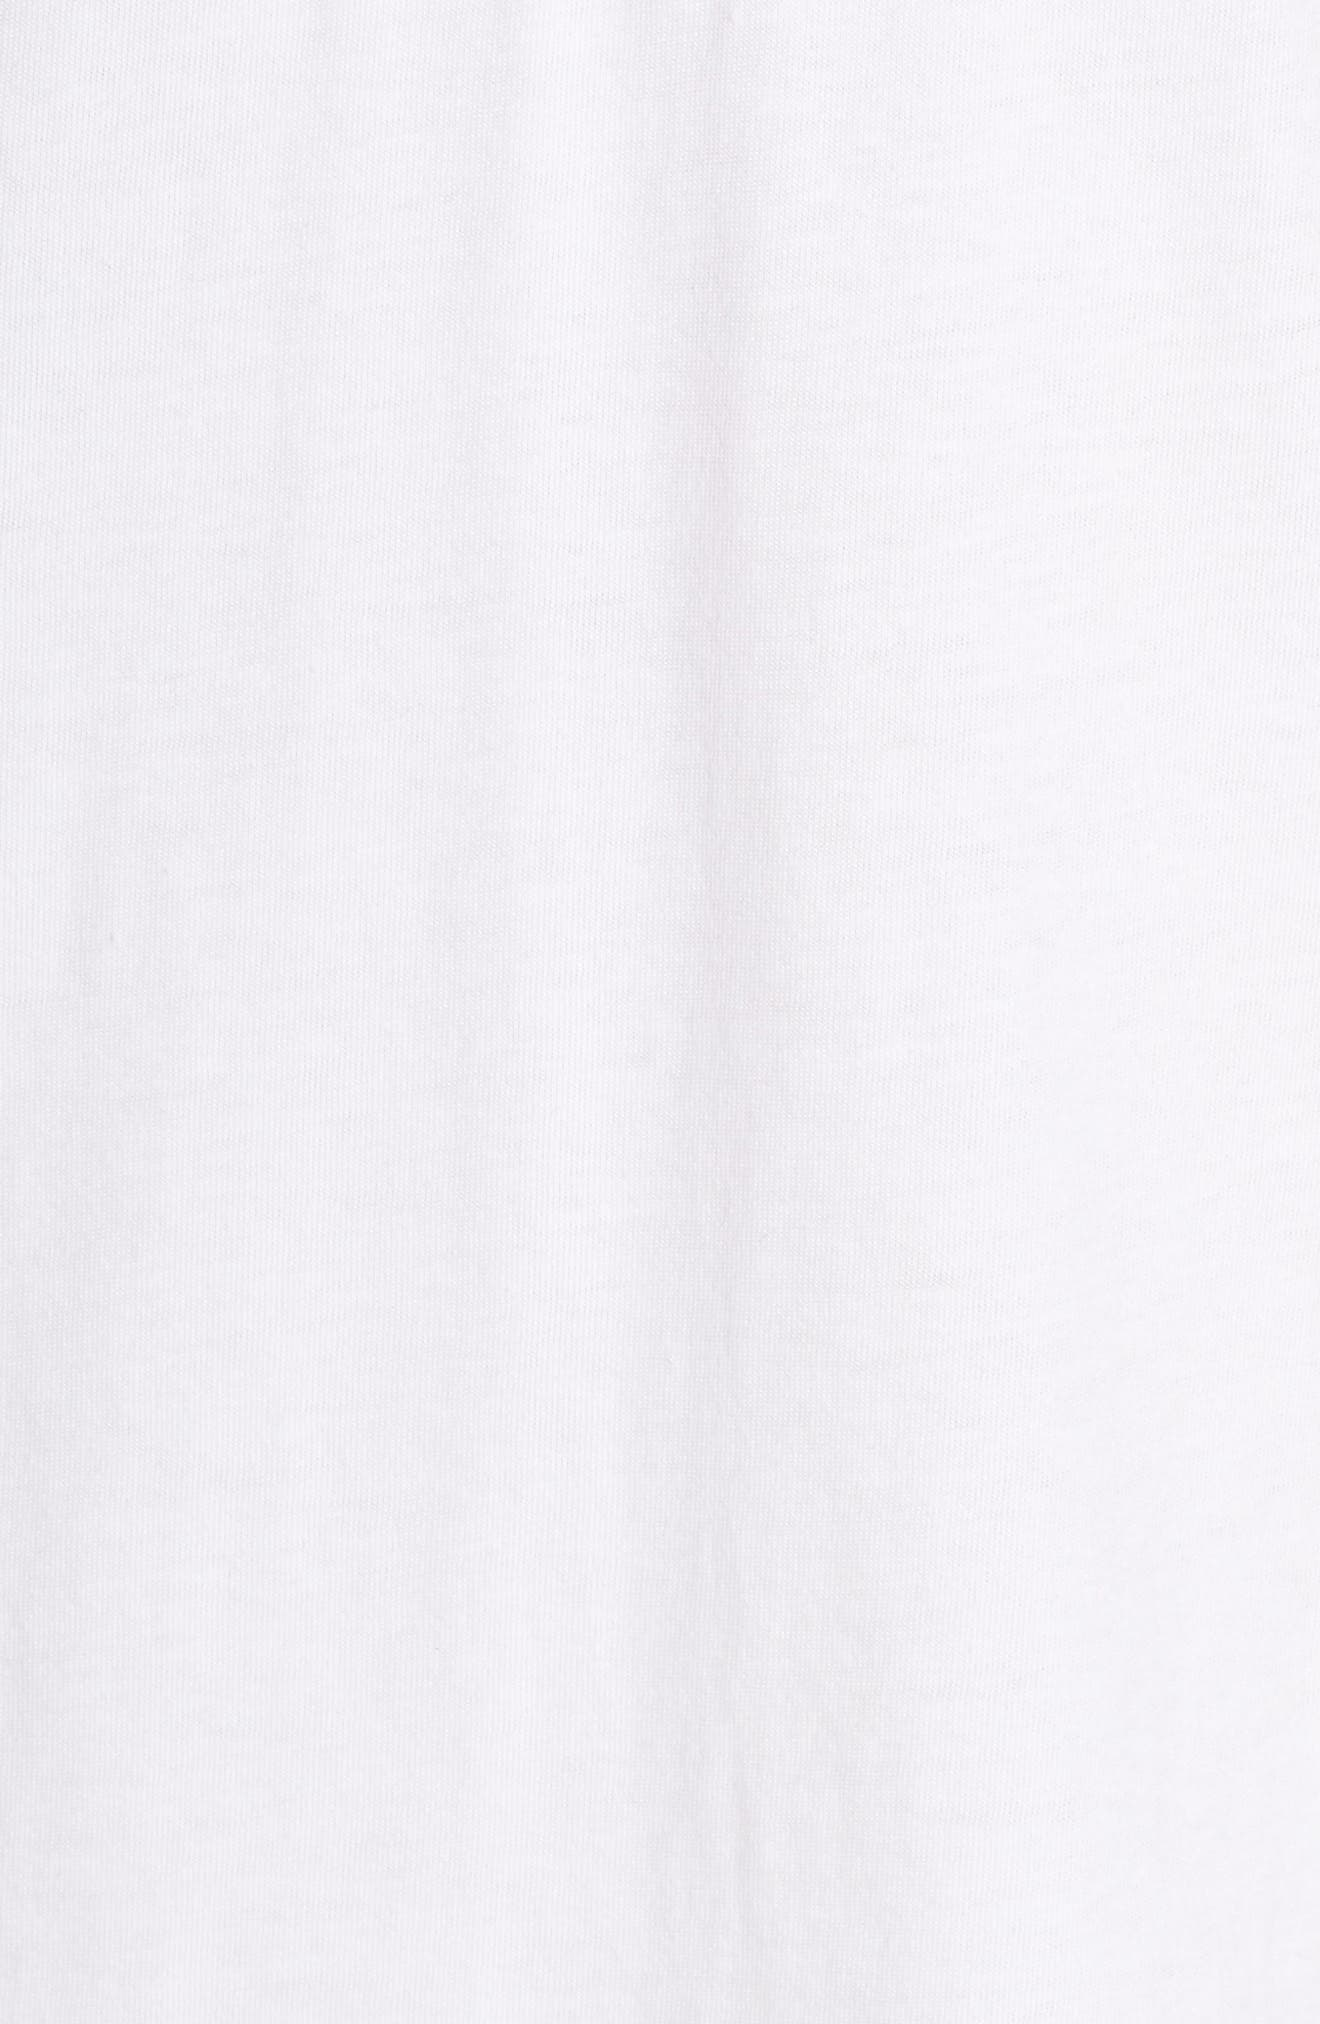 CLRDO T-Shirt Dress,                             Alternate thumbnail 6, color,                             100